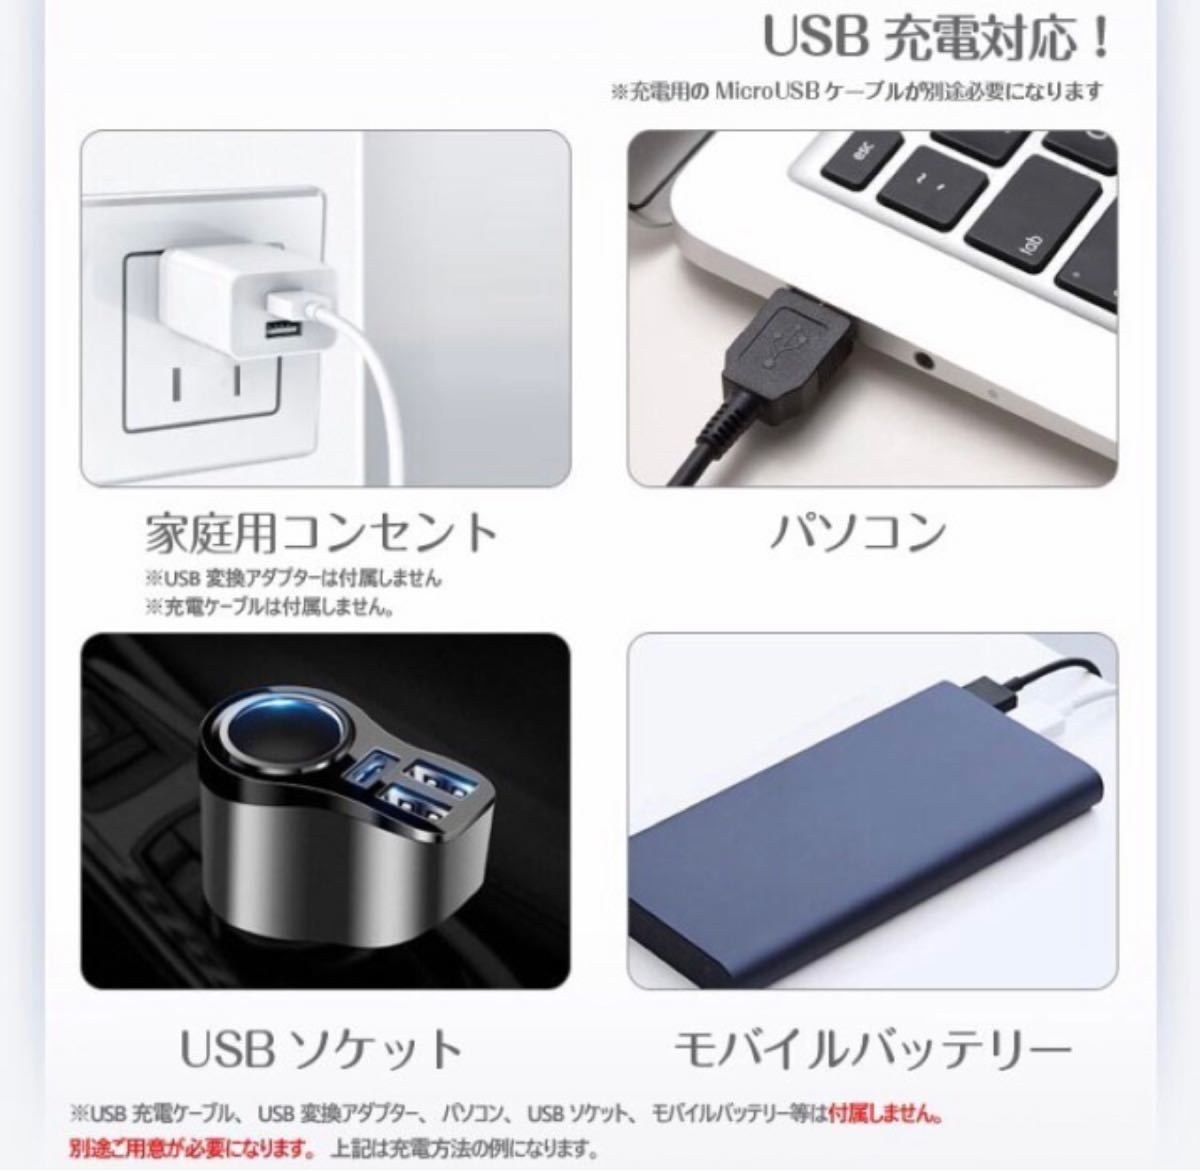 LED懐中電灯 ハンディライト超高輝度USB充電式ズーム式SOS点滅防災停電対策